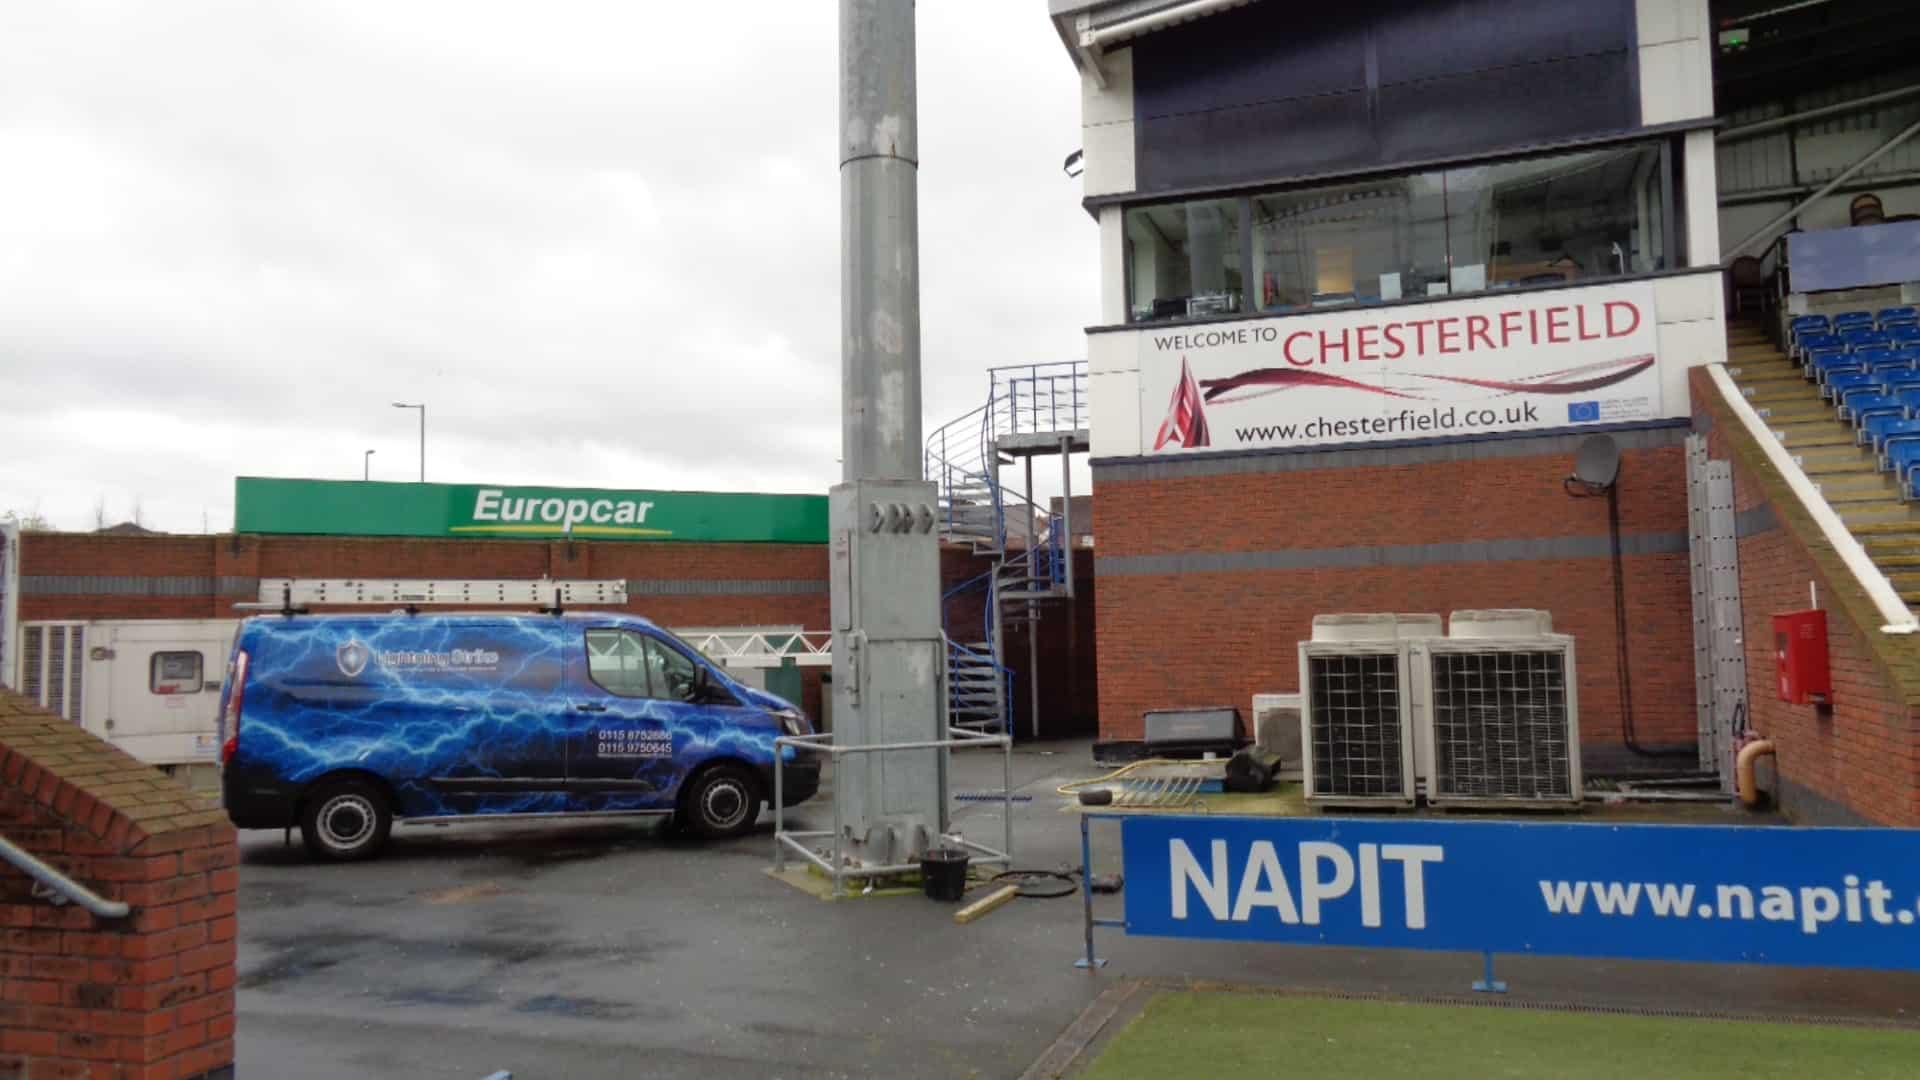 Lightning Strike Van at Chesterfield FC